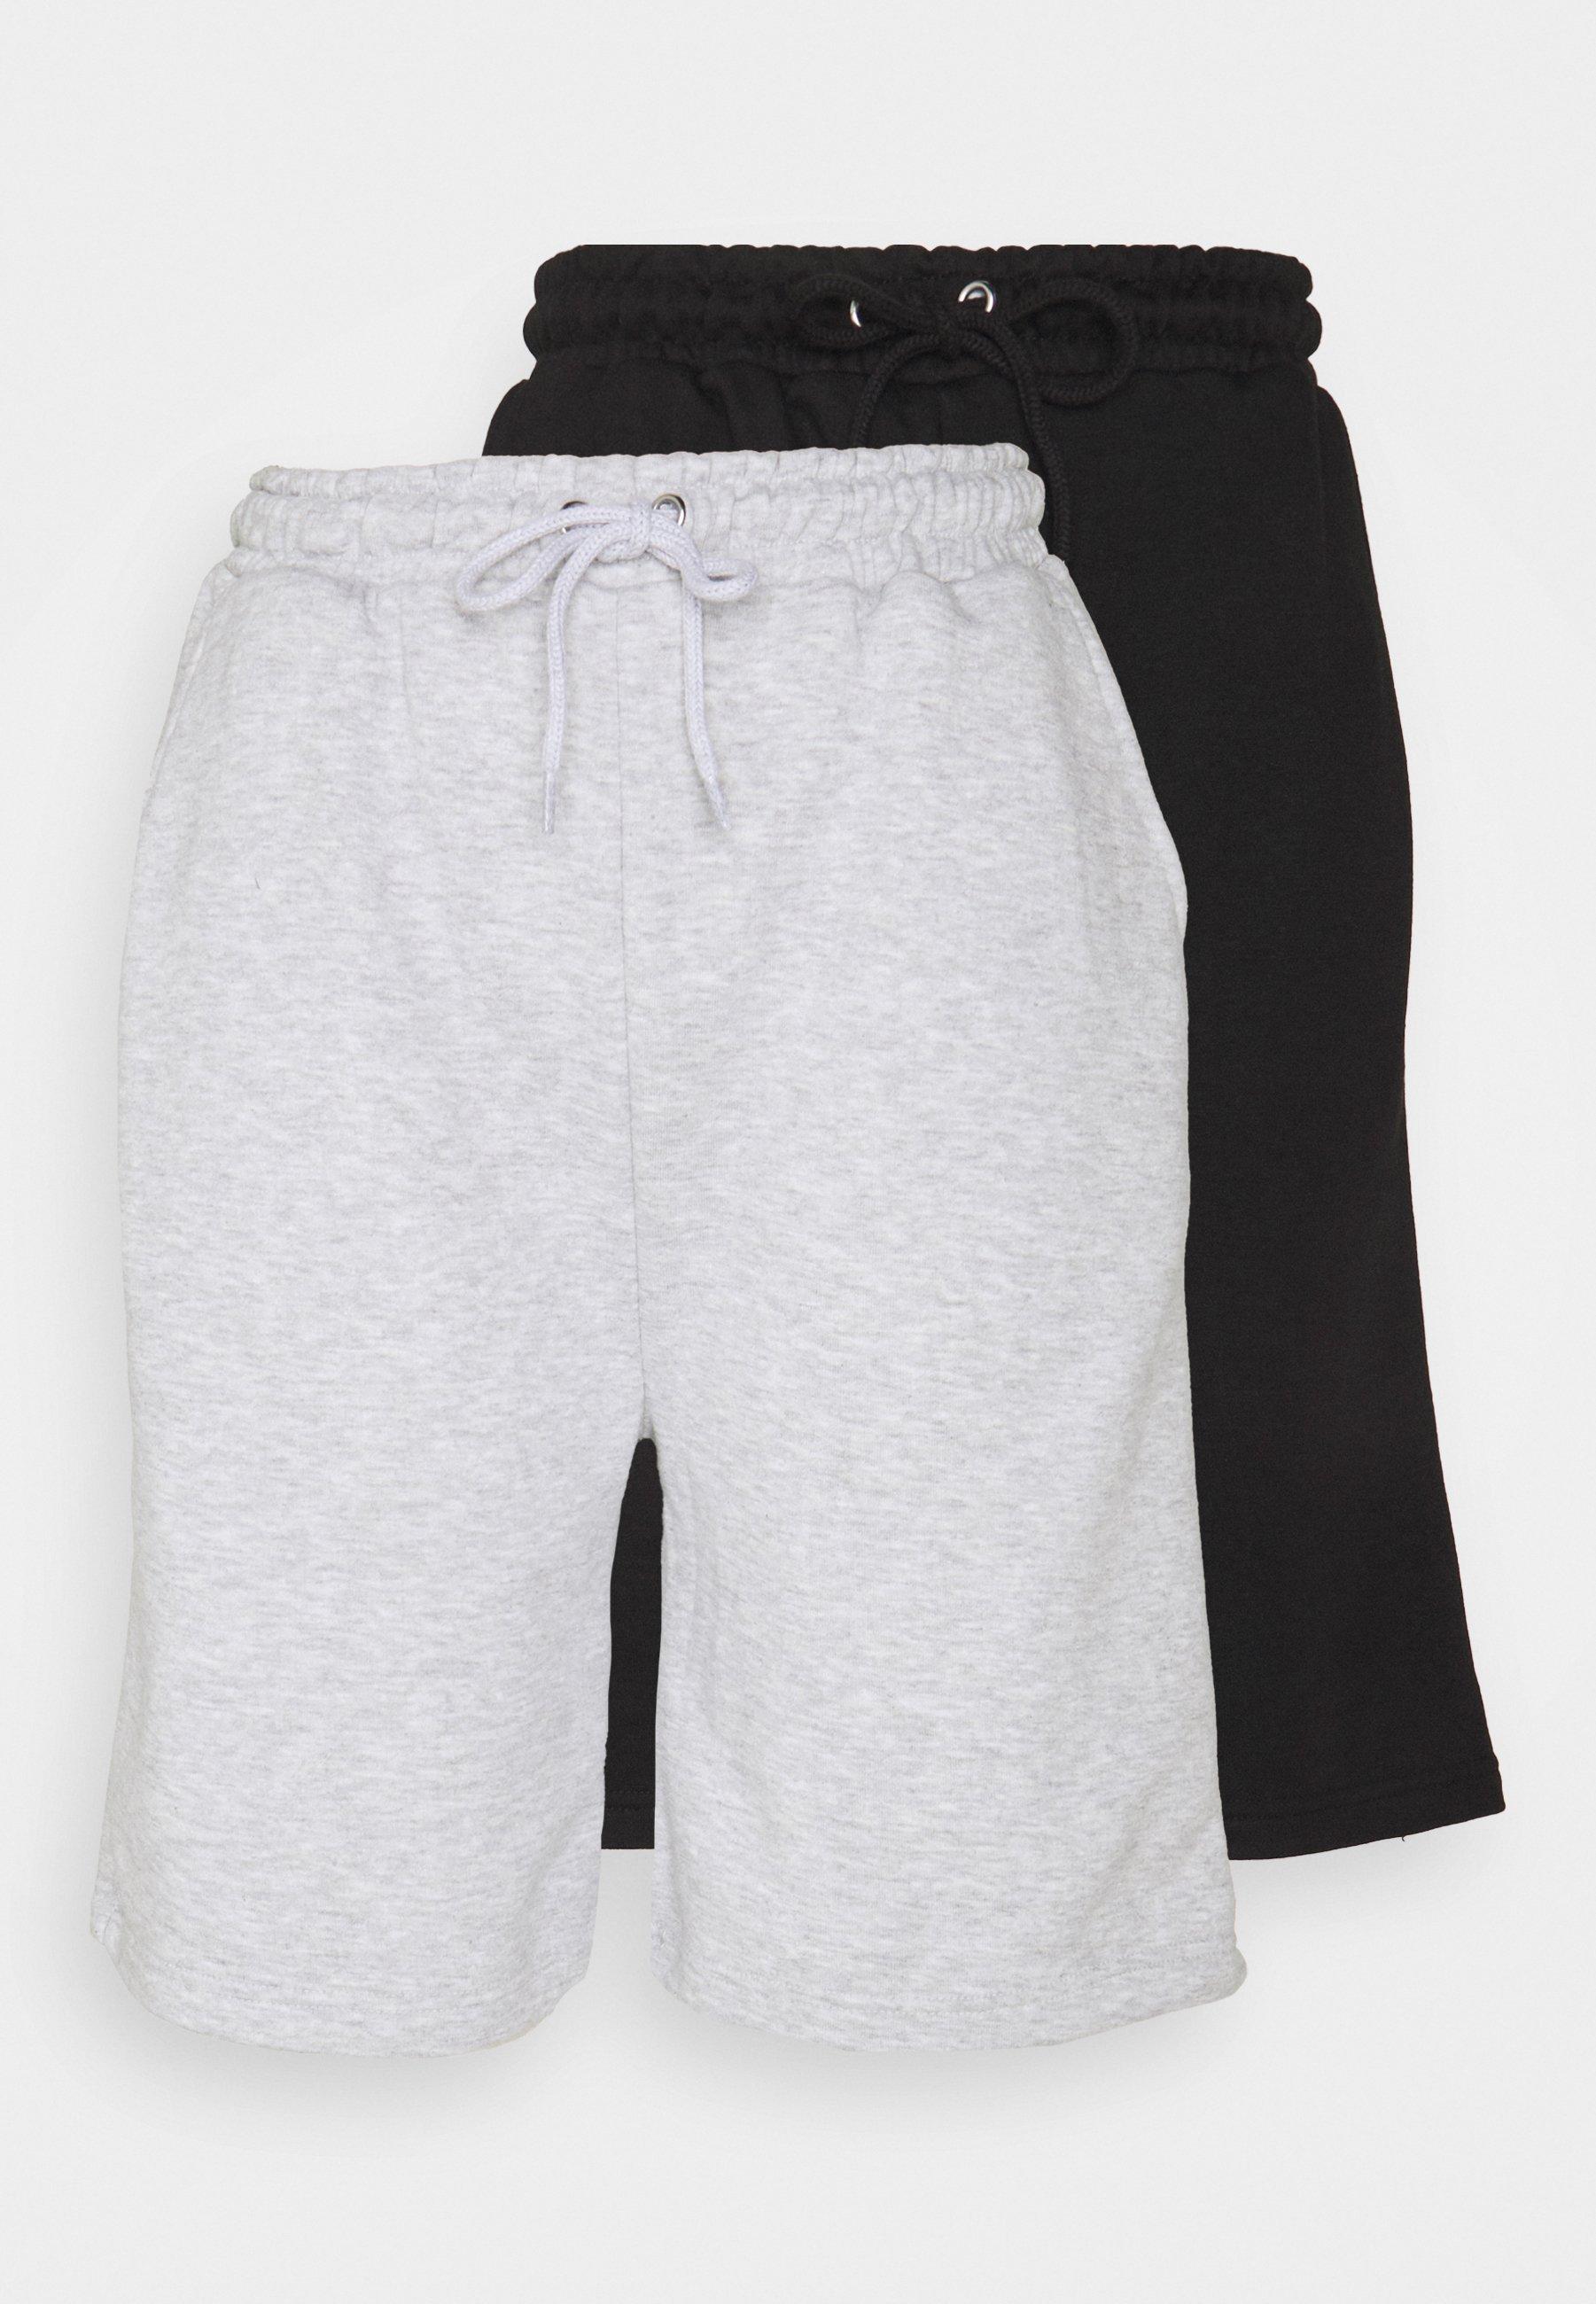 Femme CASUAL PLAIN 2 PACK  - Short